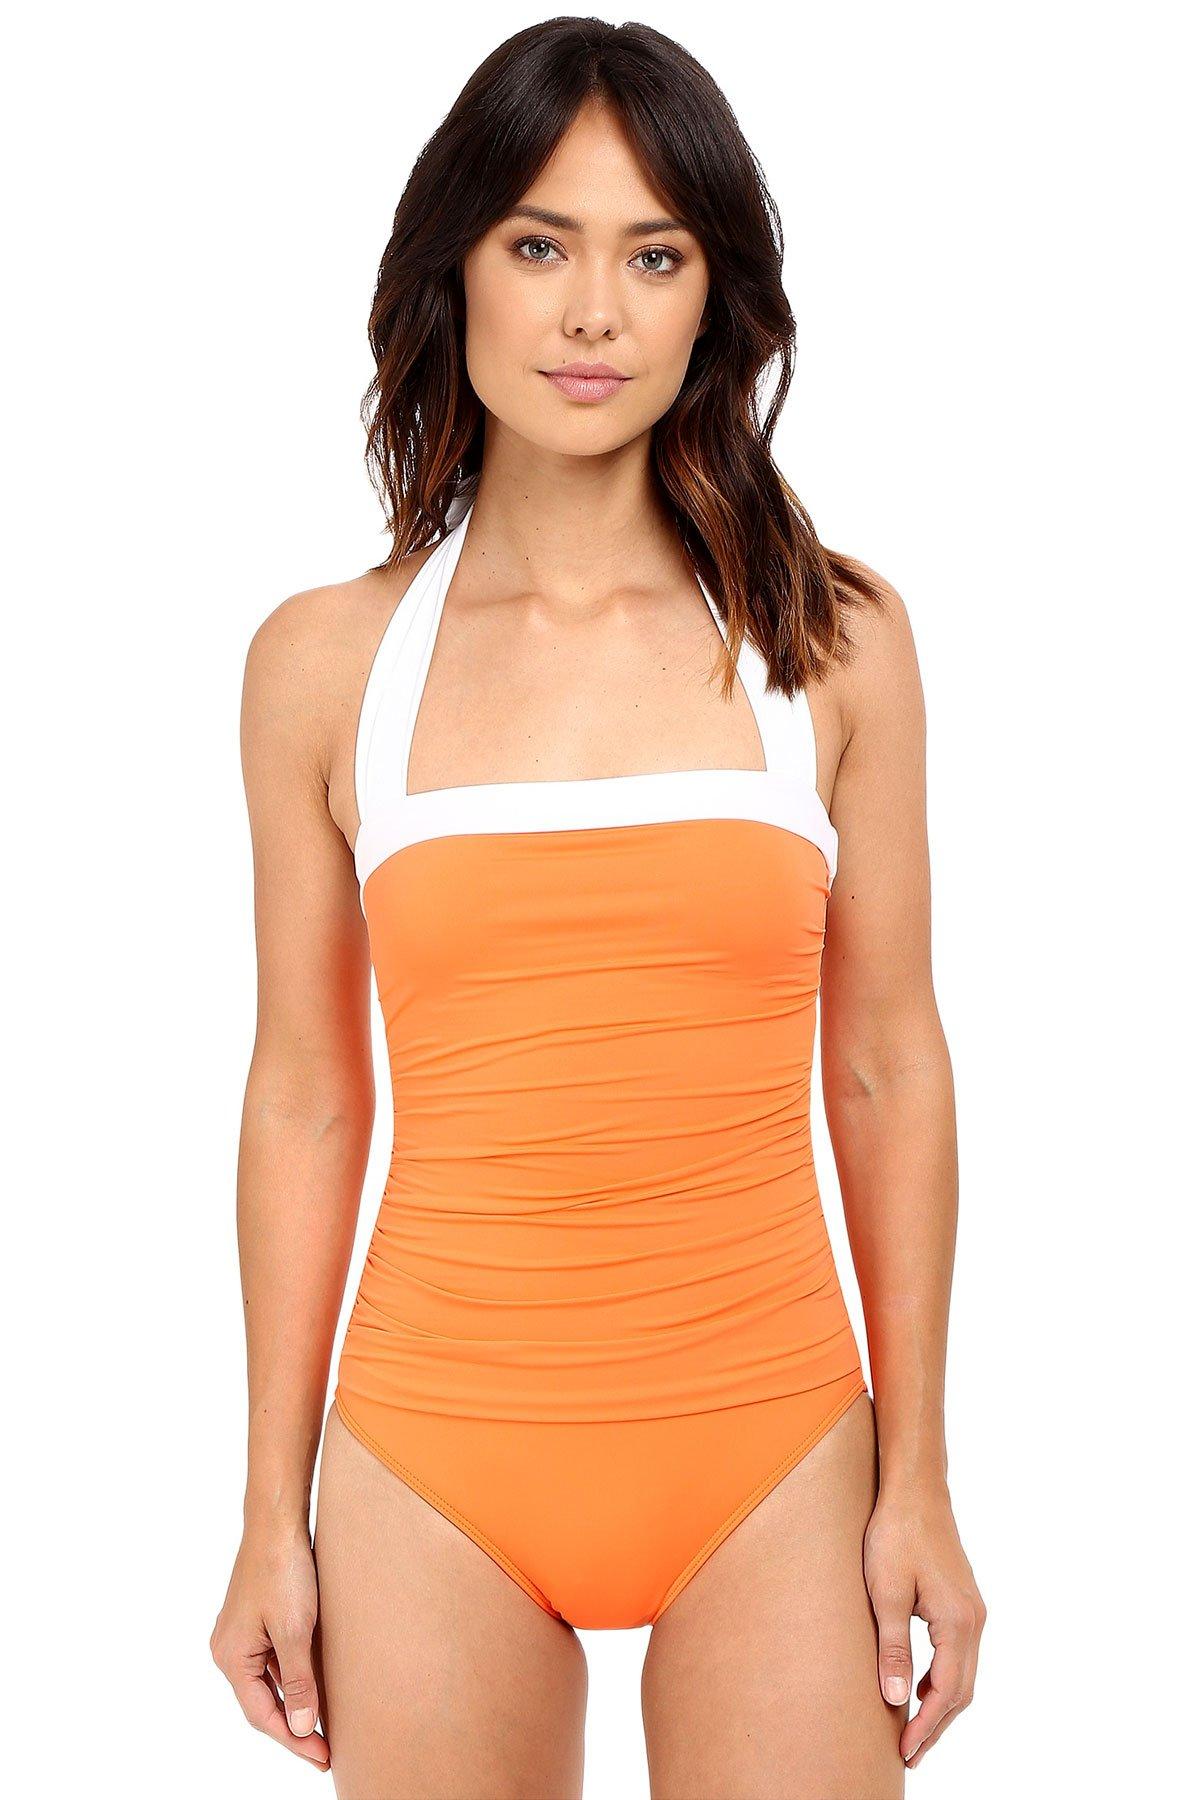 LAUREN Ralph Lauren Women's Bel Aire Solids Shirred Bandeau Mio Slimming Fit w/ Soft Cup Tangerine Swimsuit